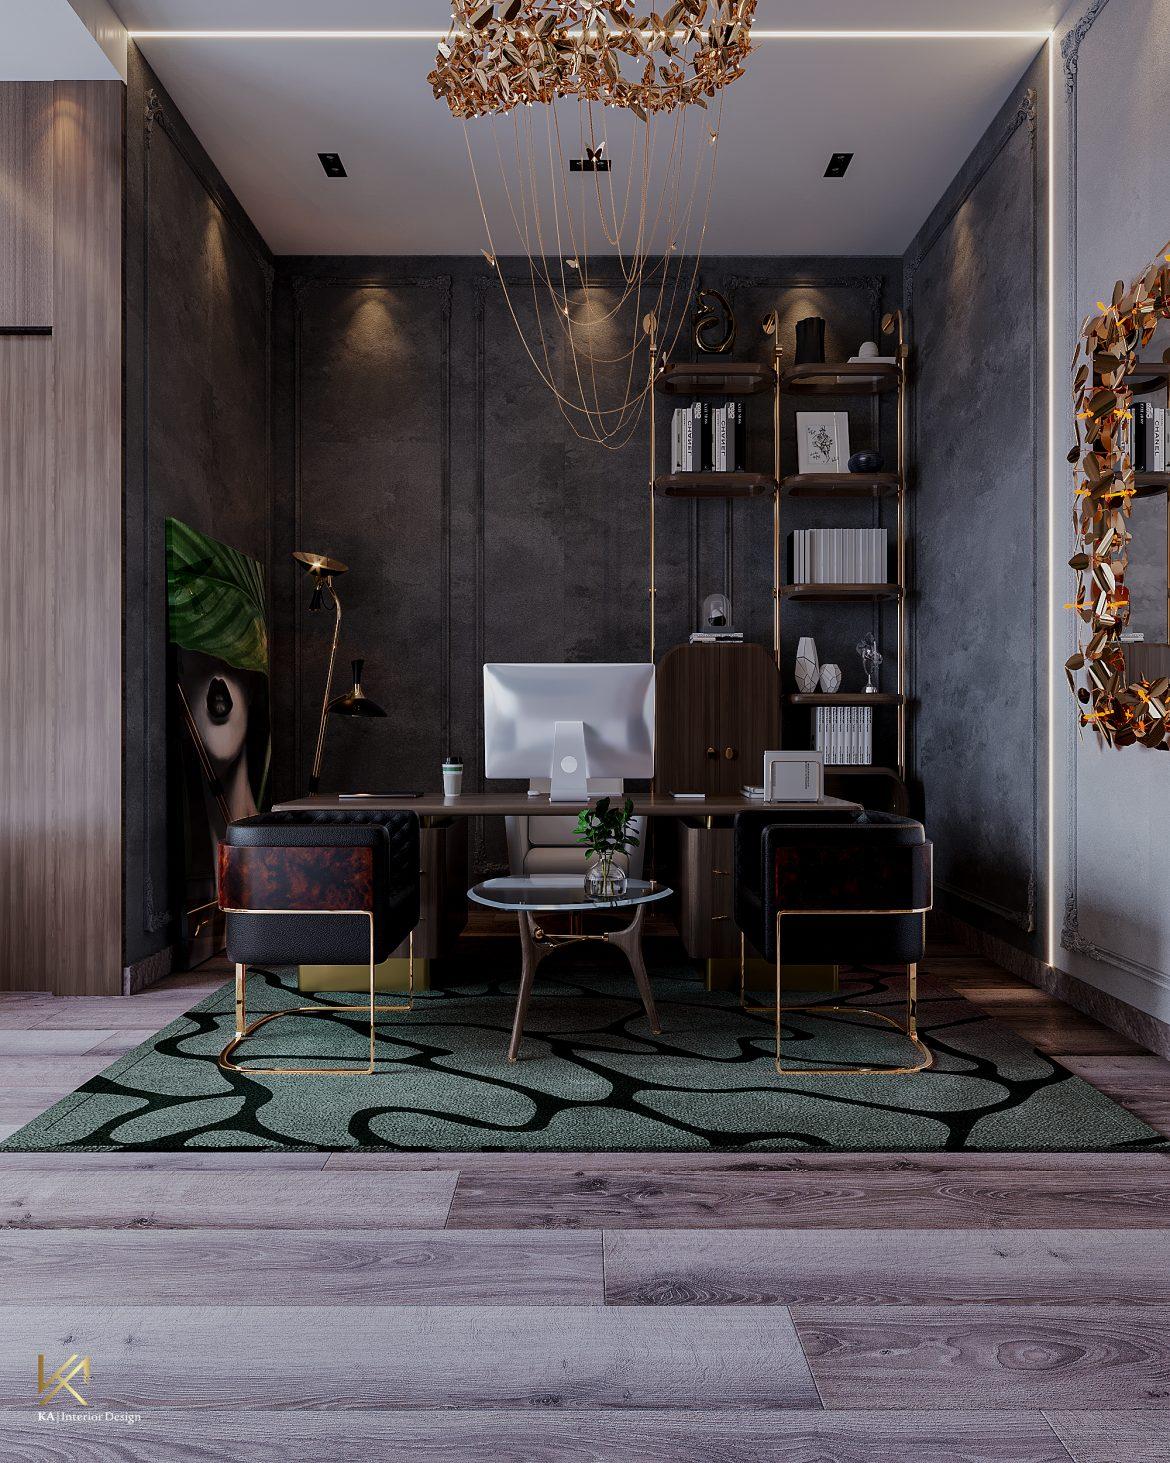 Covet House x K.A Interior Design:  A Opulent Modern Classic Villa In Riyadh Office Room 1